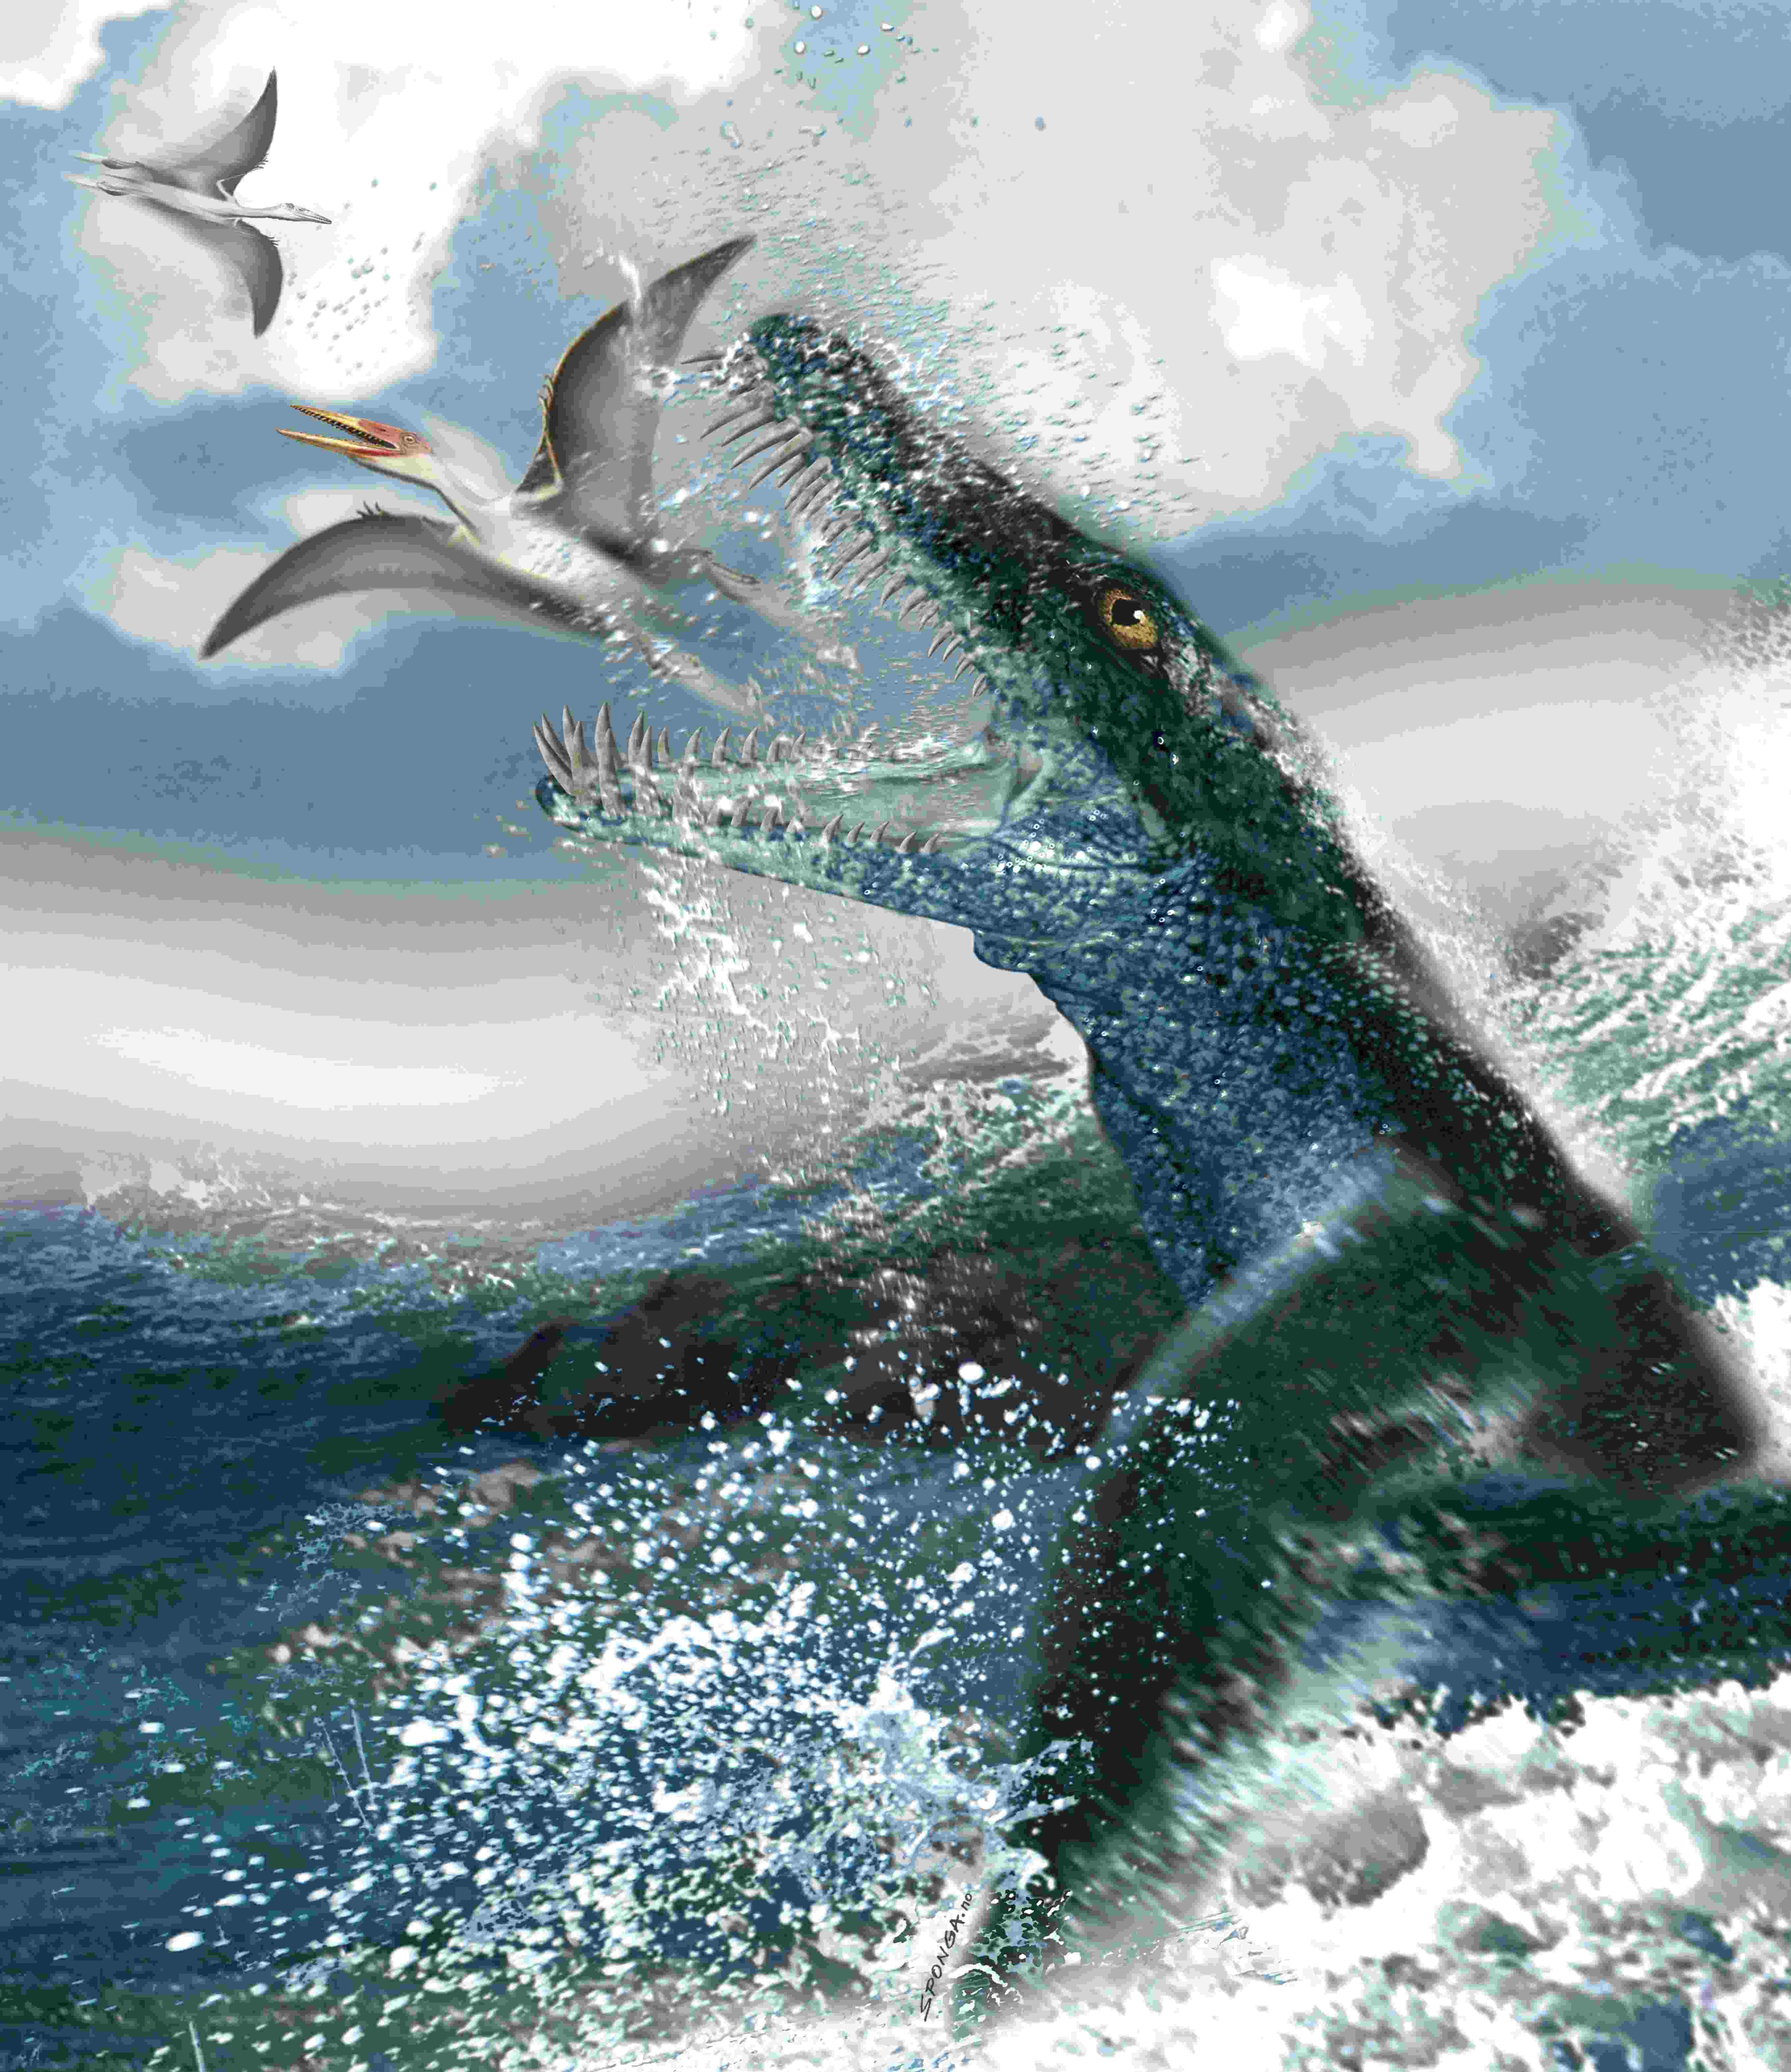 /enpproperty-->  北极发现1.5亿年前最大上龙化石  北极发现1.5亿年前最大上龙化石。这是画家根据化石和相关资料绘制的上龙捕食情景  这种史前海洋动物的体长可达15米,撕咬力惊人 中国日报网环球在线消息:一个挪威科研小组2月27日称,他们在北极岛屿上发现的距今1.5亿年的海洋爬行动物化石是迄今发现的最大的上龙,这种生活在恐龙时代凶猛异常的海怪体长约15米,牙齿巨大,撕咬力惊人,可一口吞下一辆小轿车。 据英国媒体报道,挪威奥斯陆自然历史博物馆古生物学者约恩胡鲁姆领导的科研小组2006